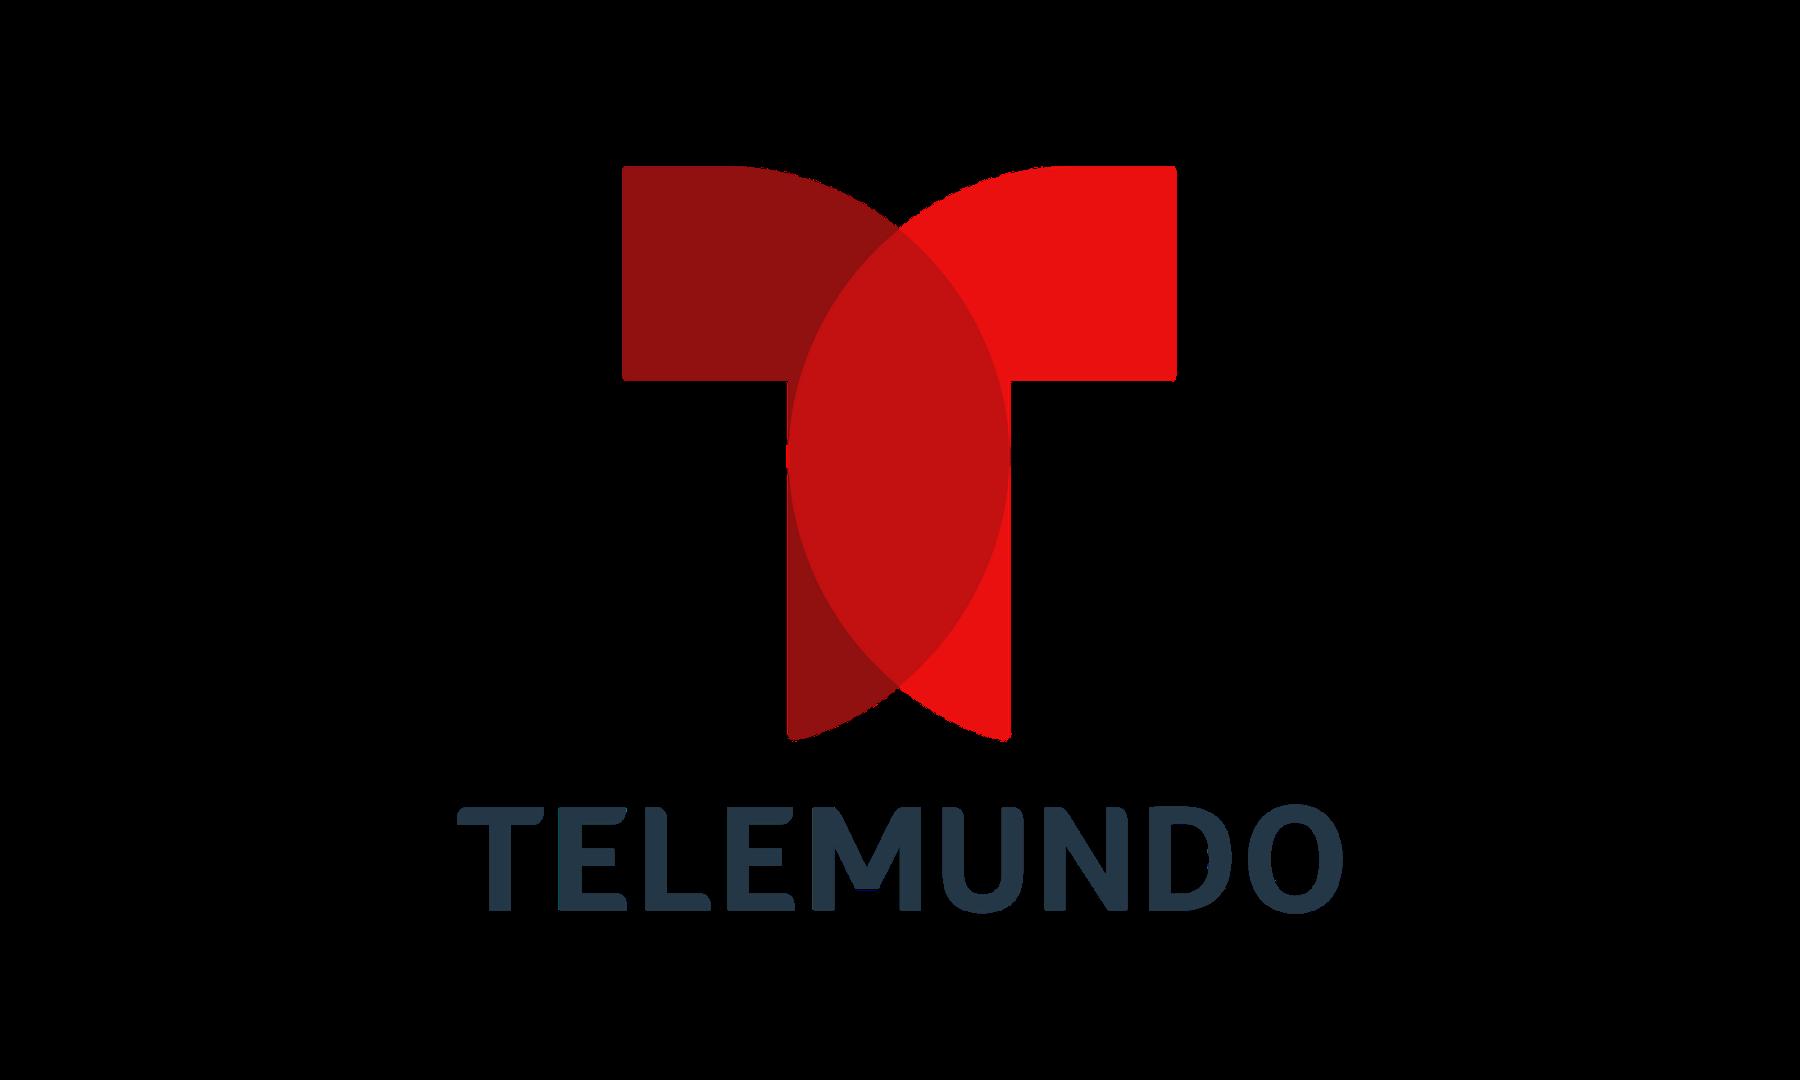 Telemundo-red-2021